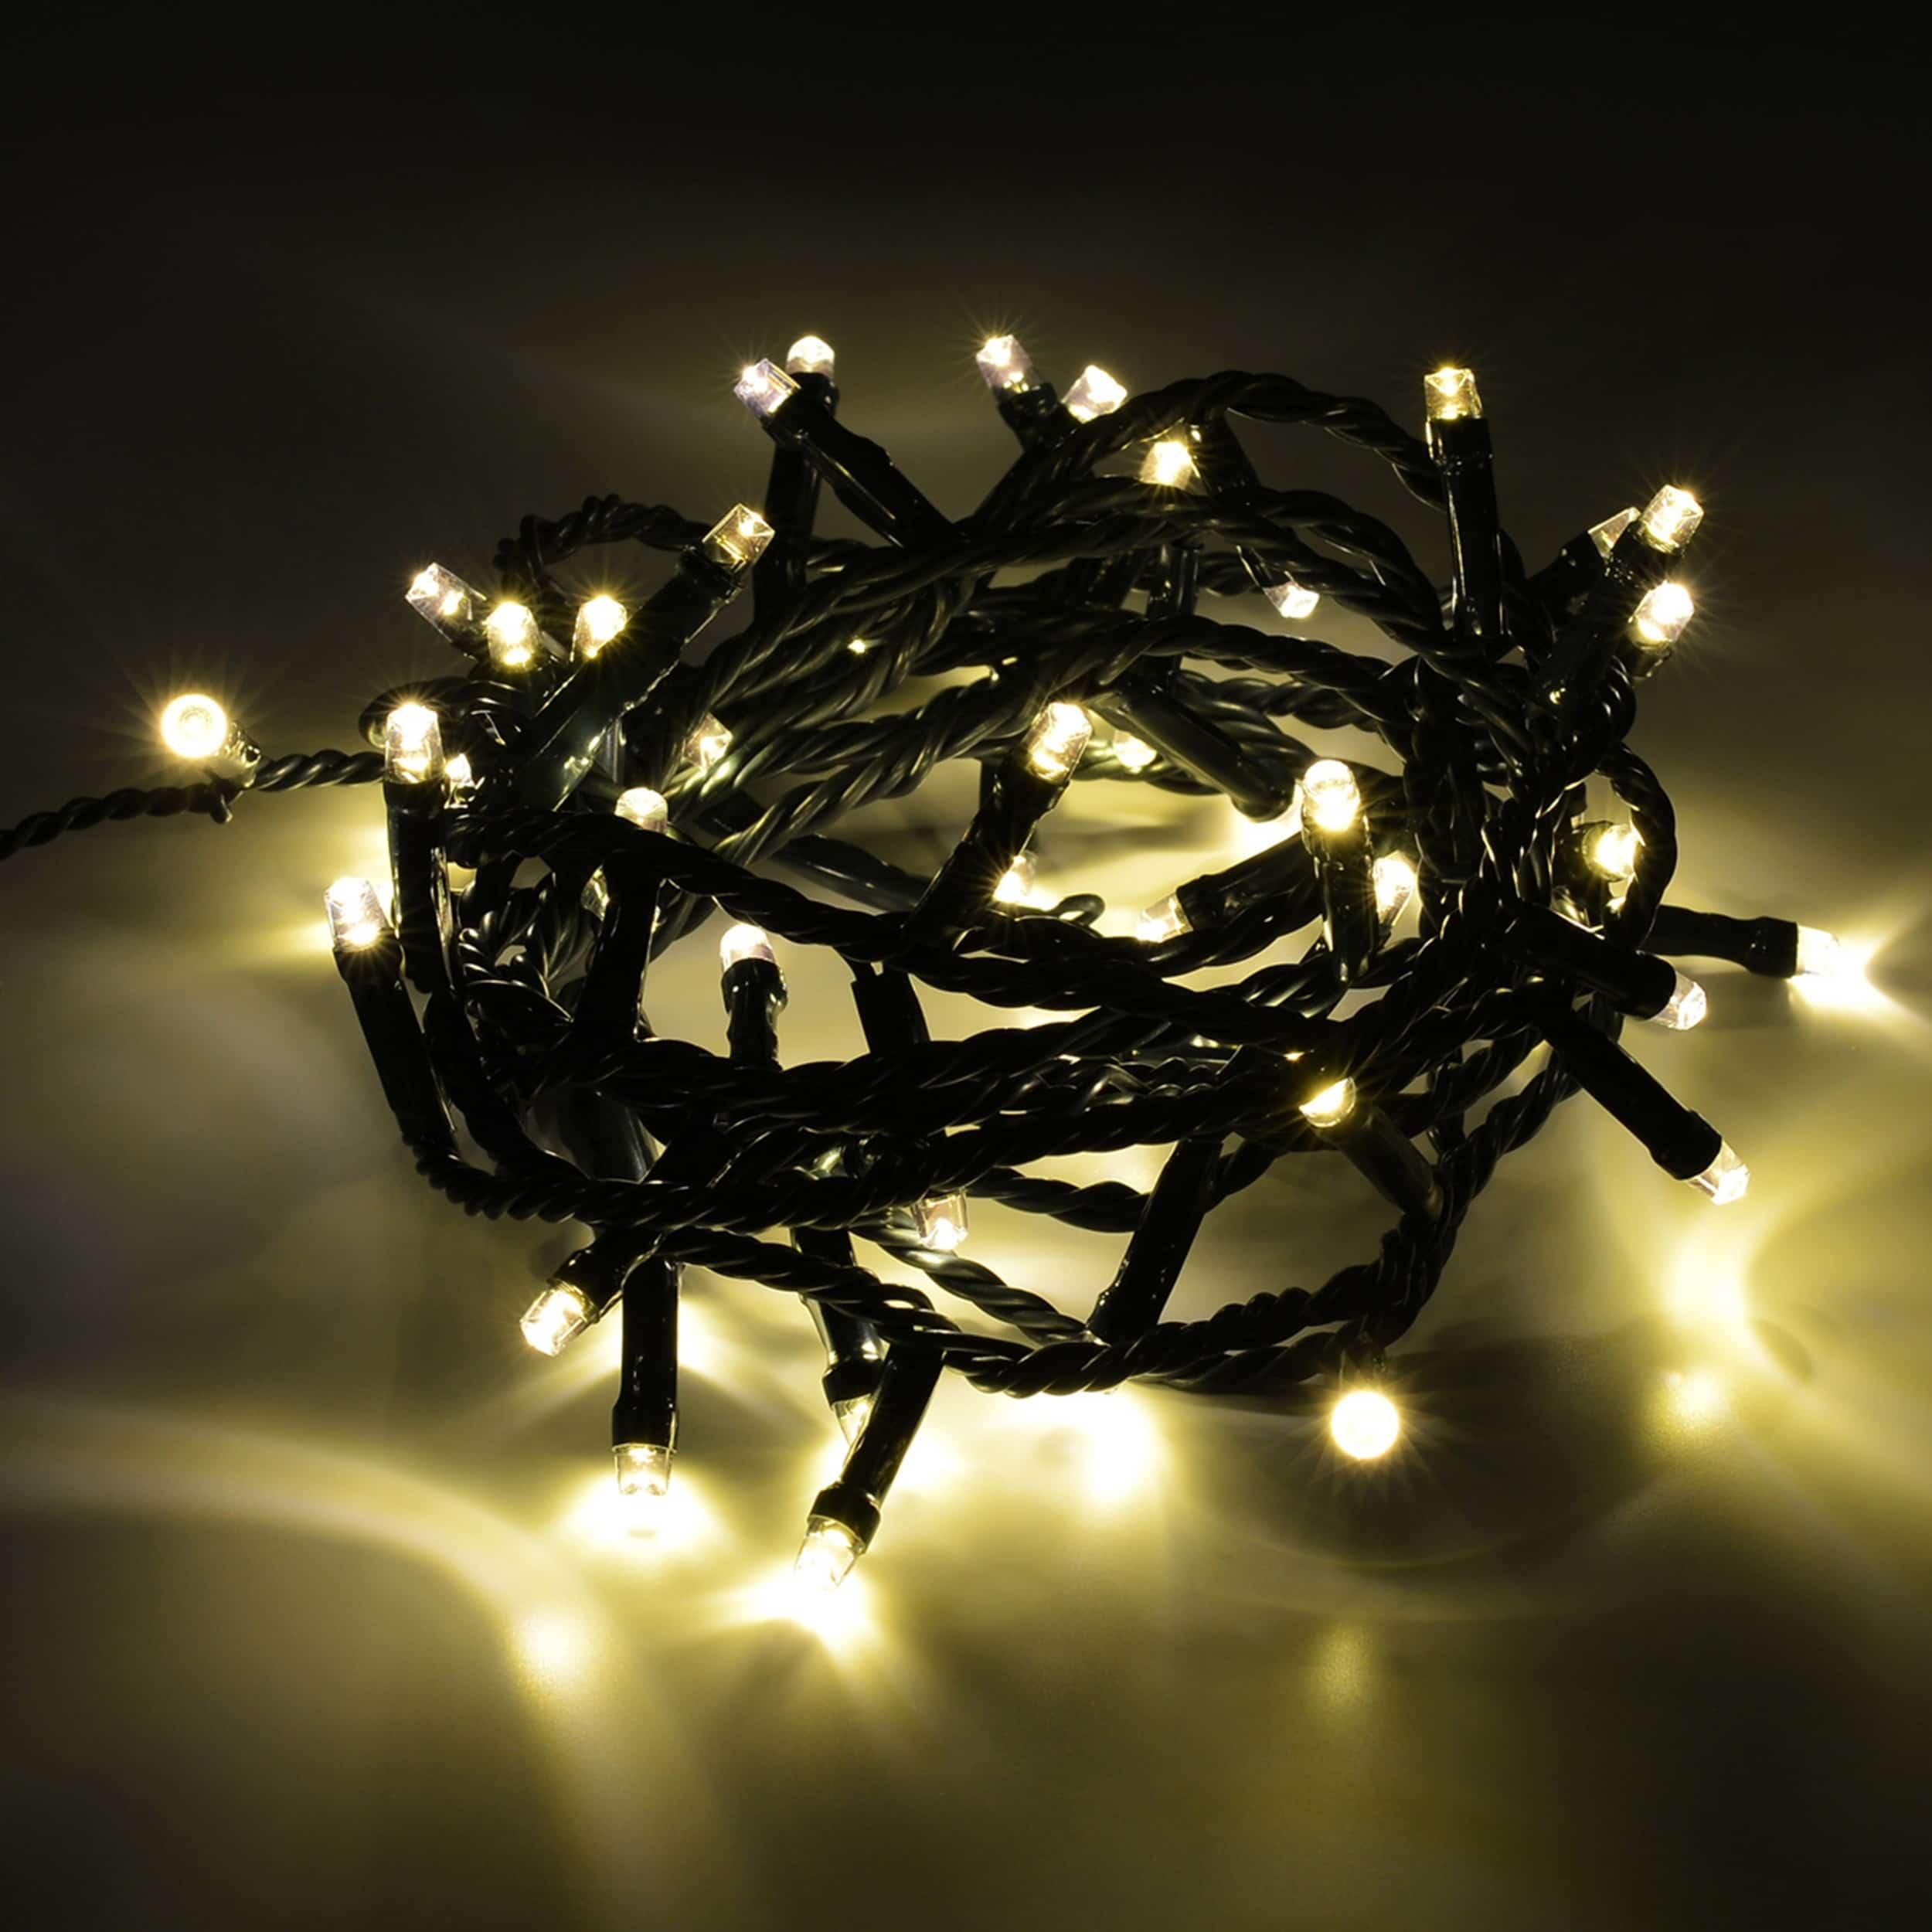 LED Lichterkette 40 LED energiesparend L200cm warmweiß